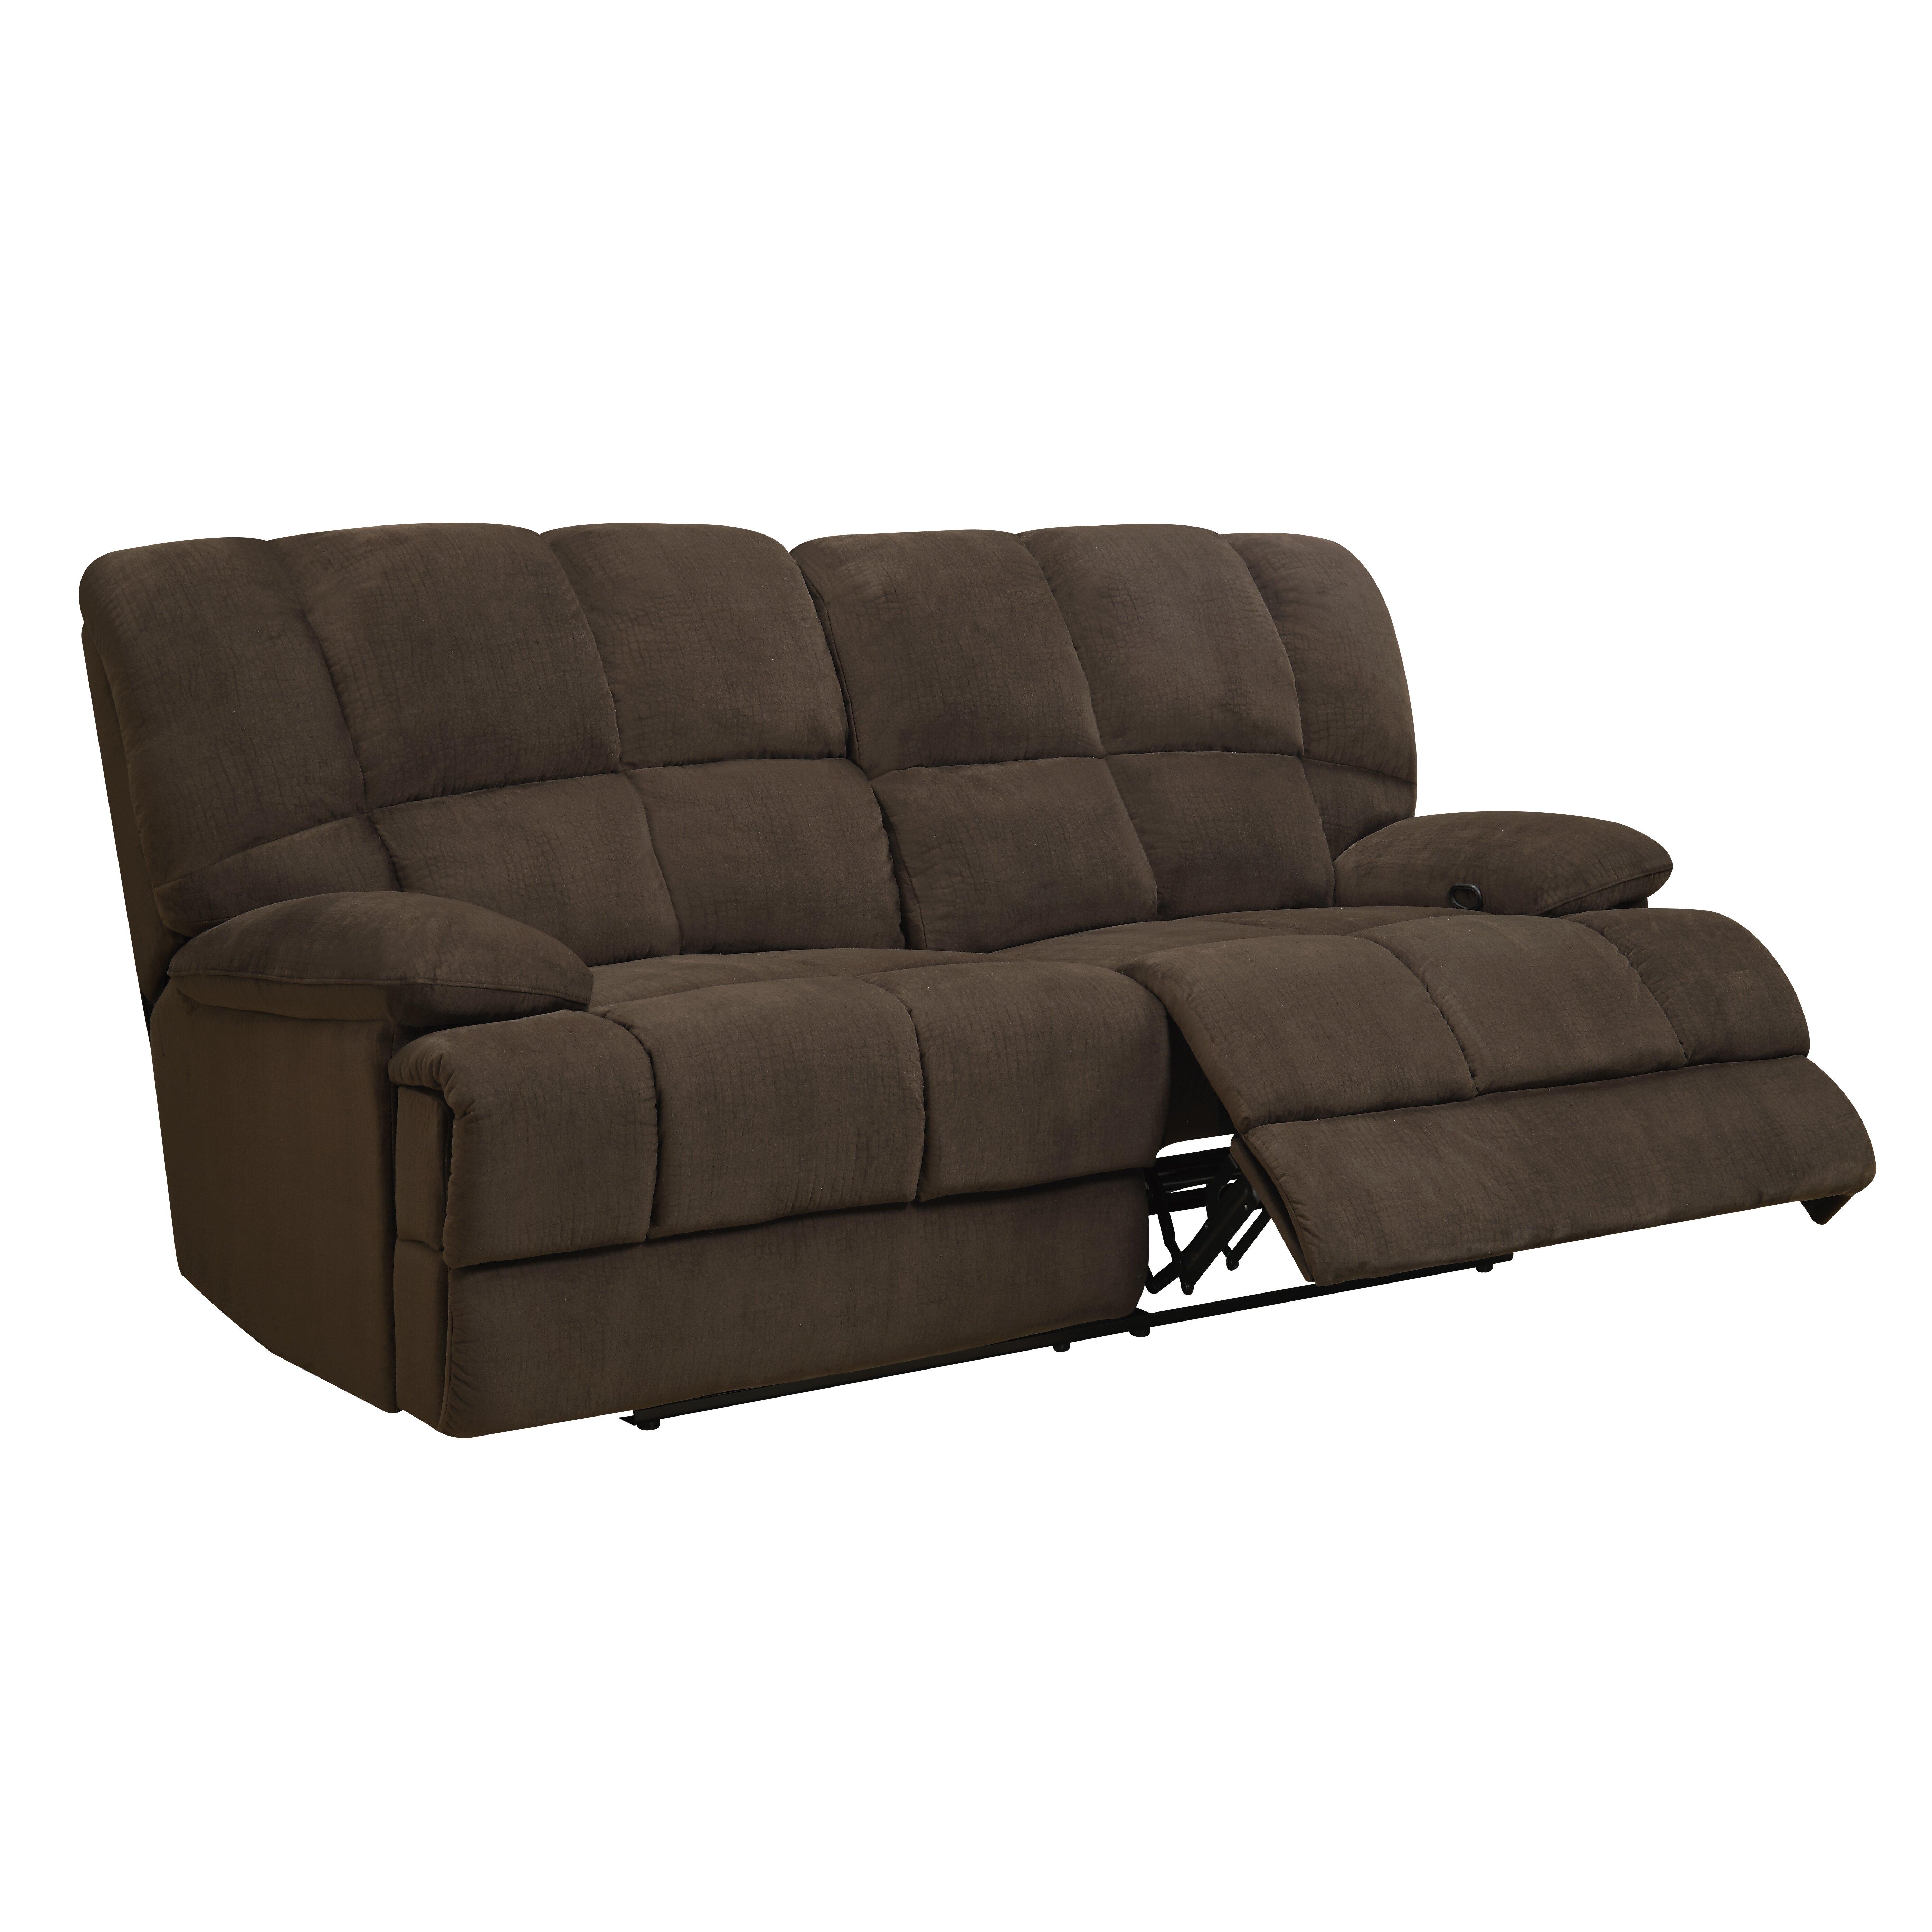 global furniture usa reclining sofa wayfair. Black Bedroom Furniture Sets. Home Design Ideas